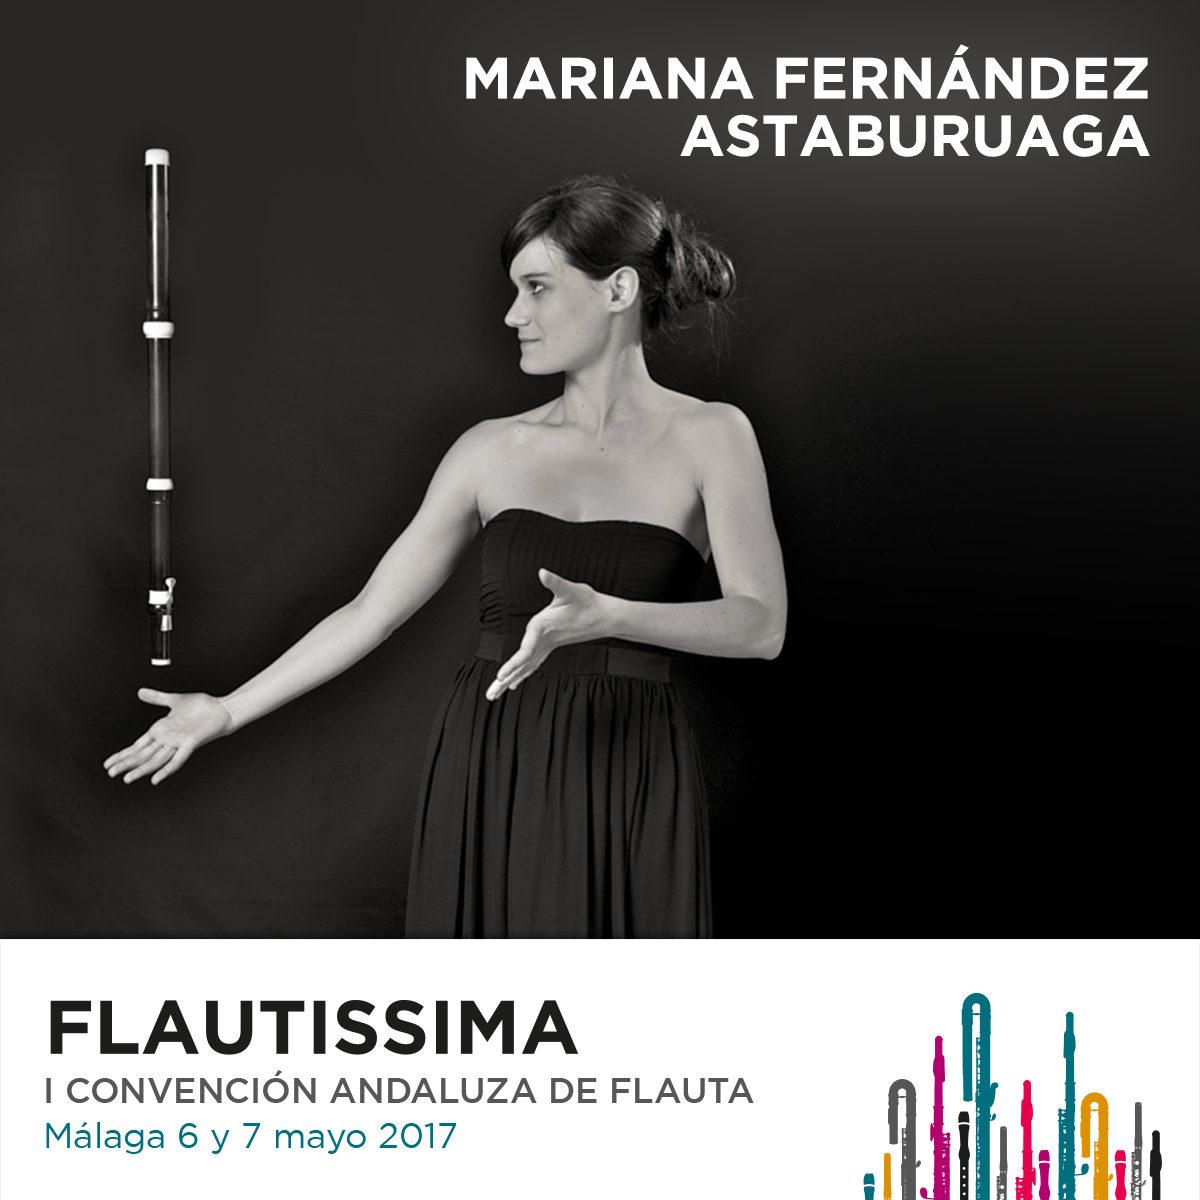 Mariana Fernández Astaburuaga Flautissima